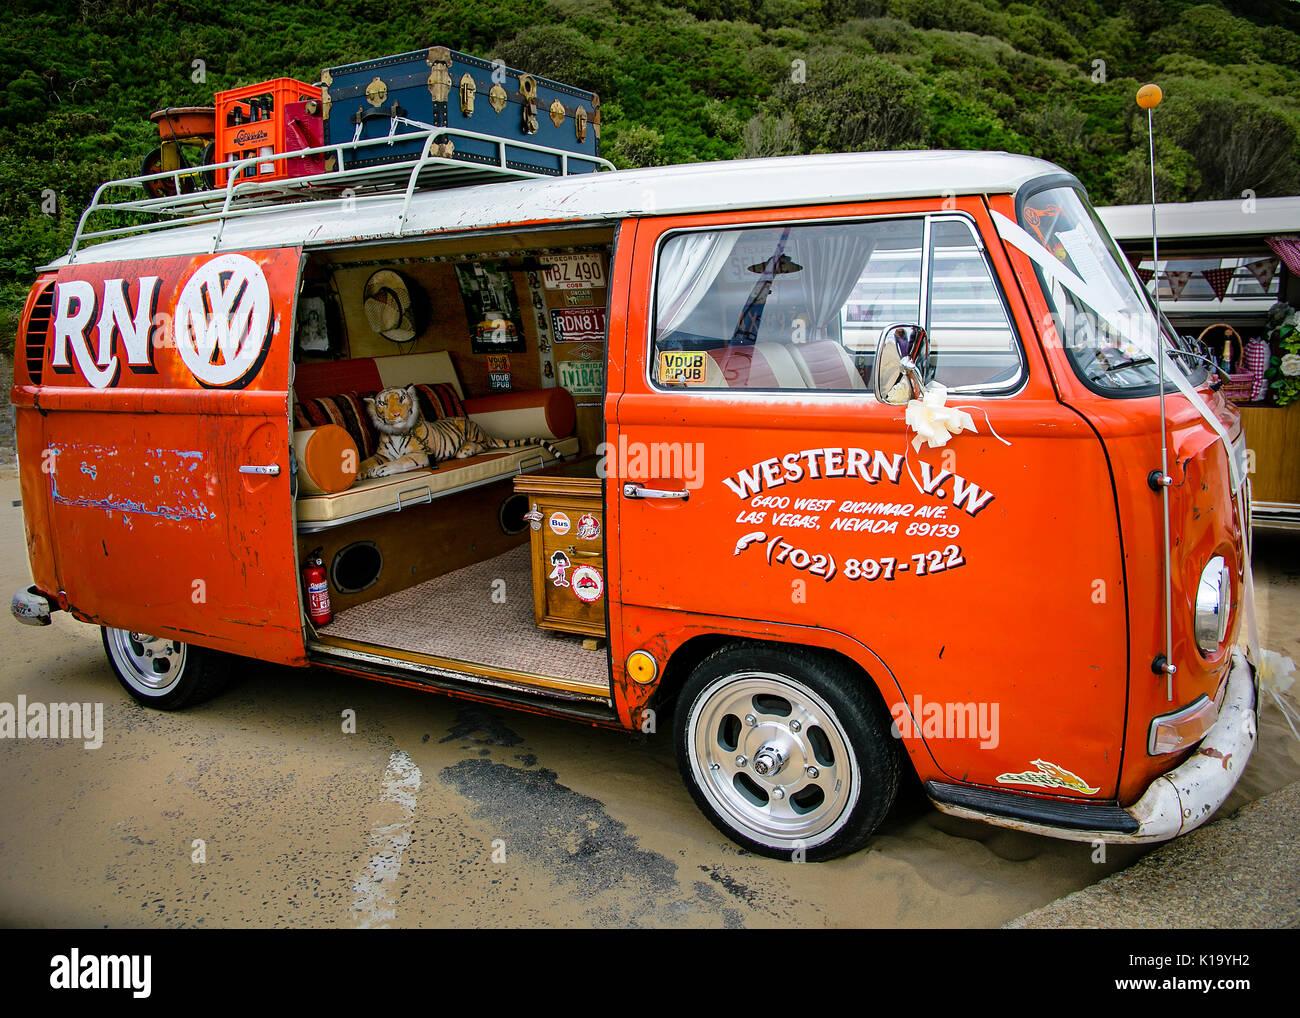 e317a2bc31 VW T2 Custom Camper Van Stock Photo  155727182 - Alamy